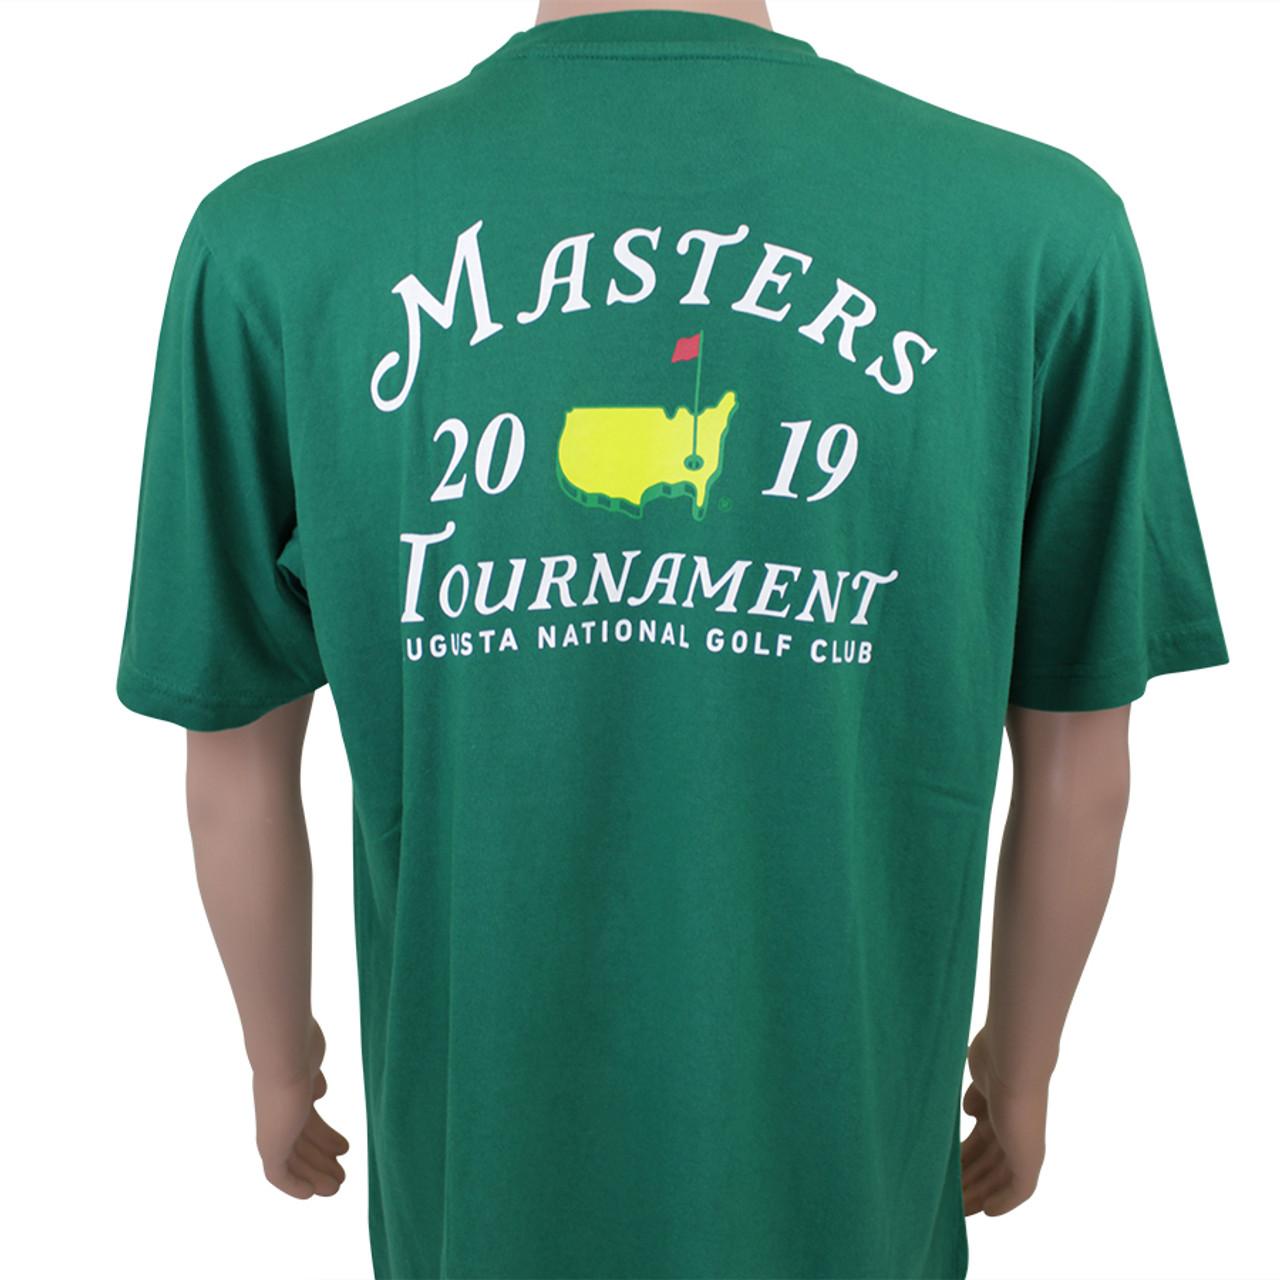 dee83aa294d 2019 Masters Green Small Logo T-shirt - Masters Tournament Specials